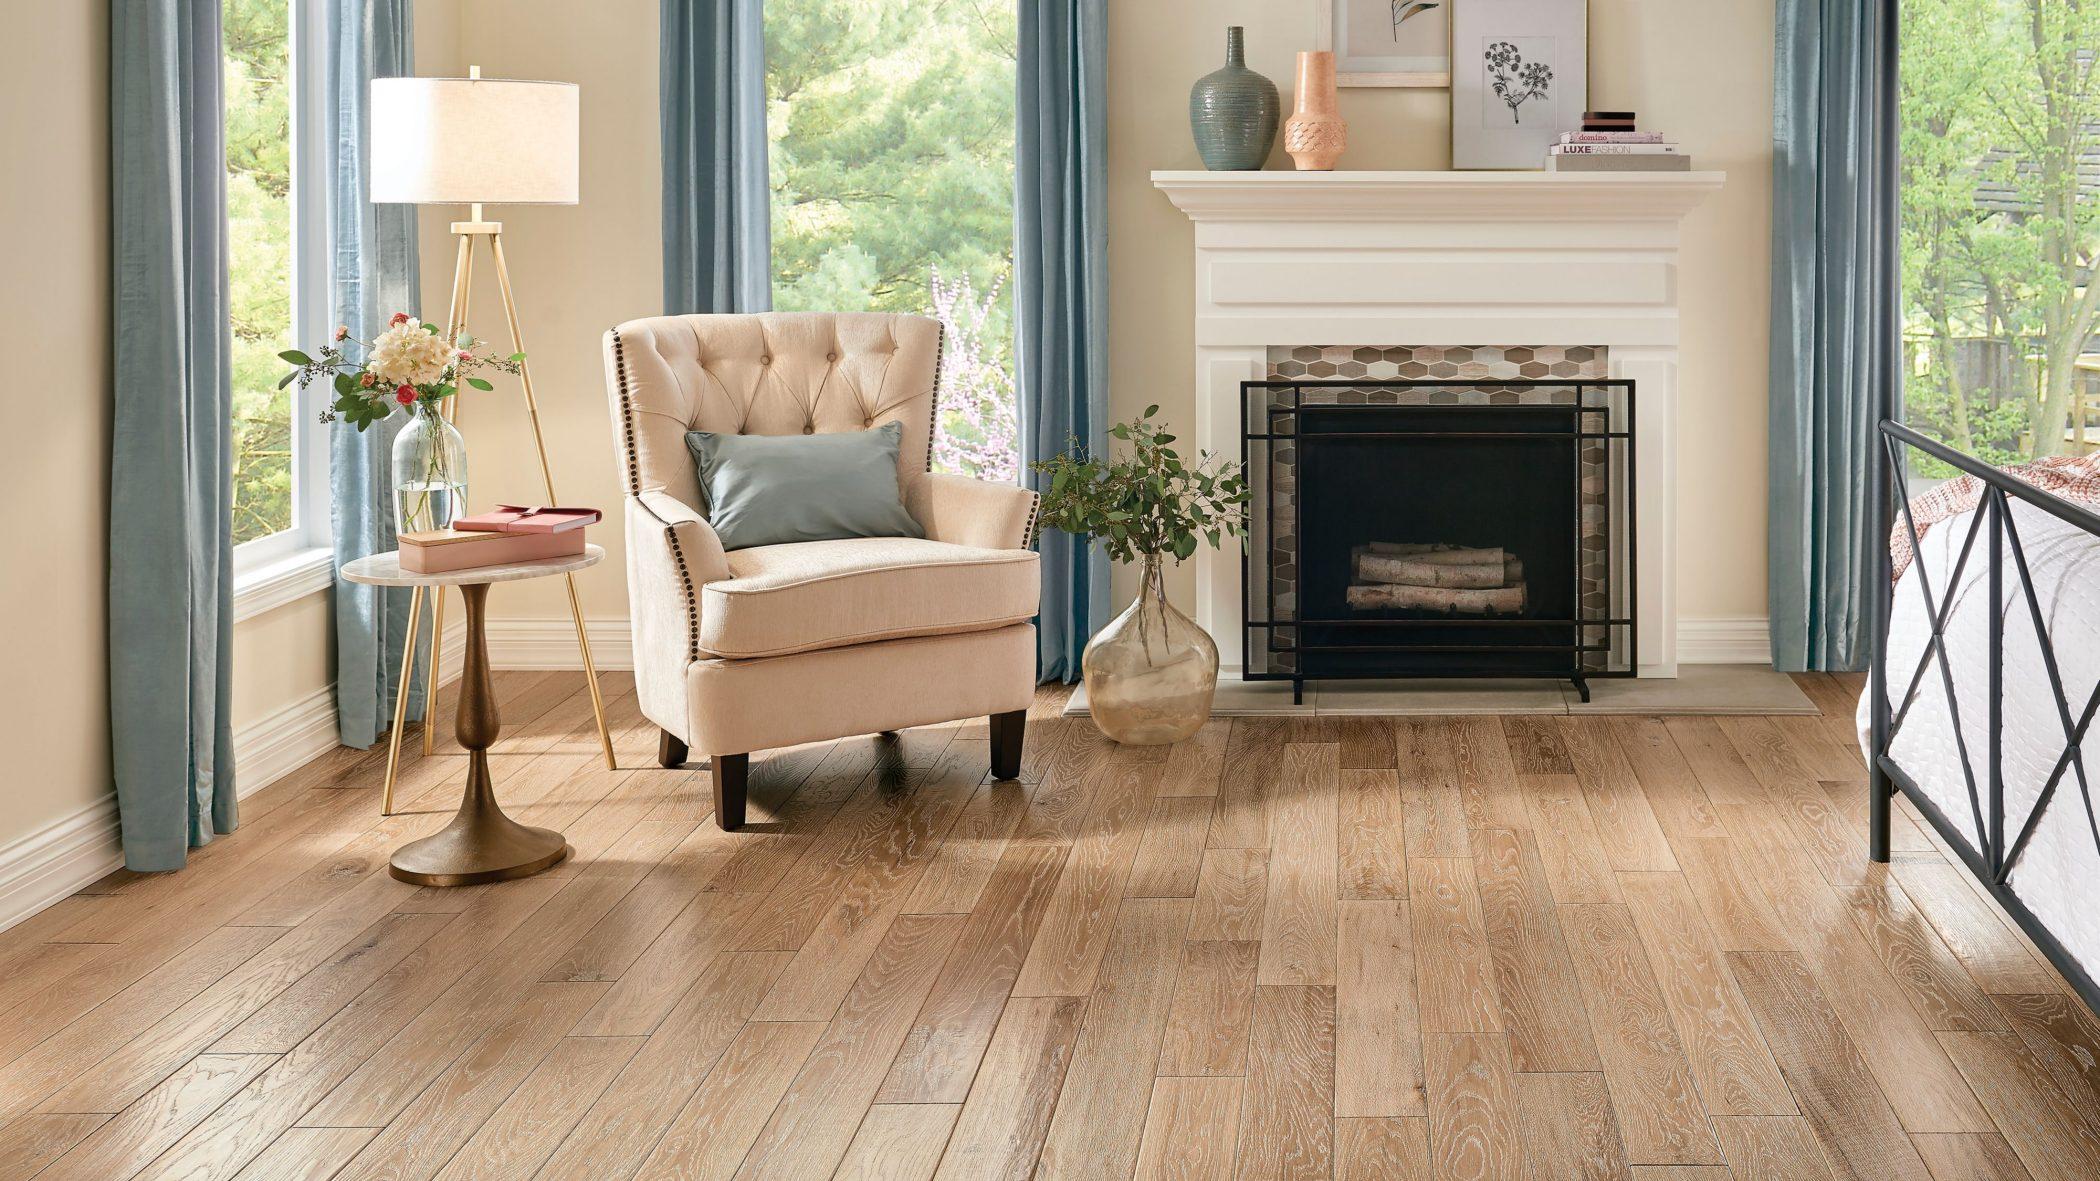 Oak Solid Hardwood - Natural Attraction.jpg